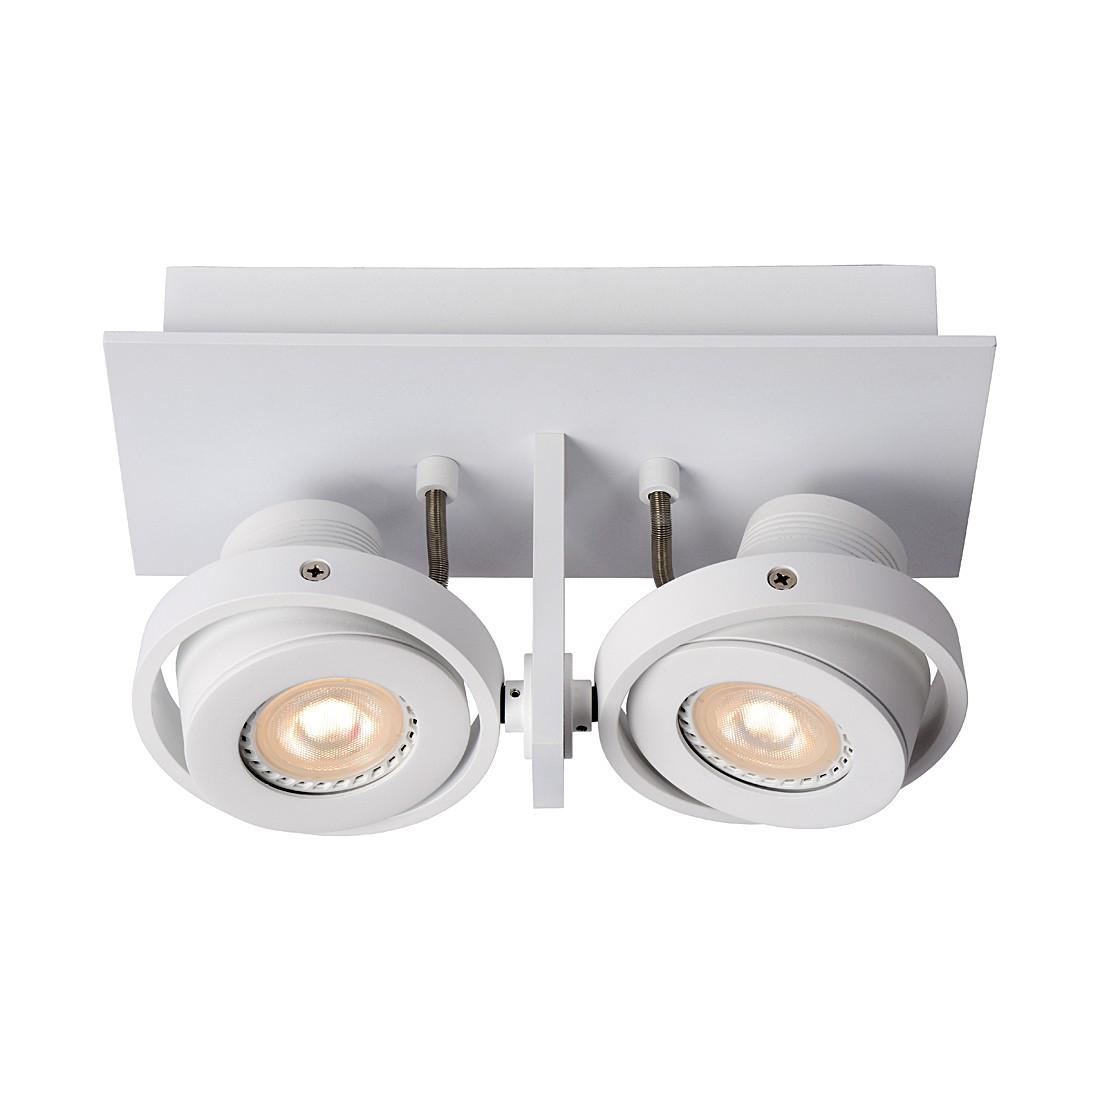 Deckenstrahler LUCI-2 LED ○ Aluminium ○ 2-flammig- Zuiver A+ ...